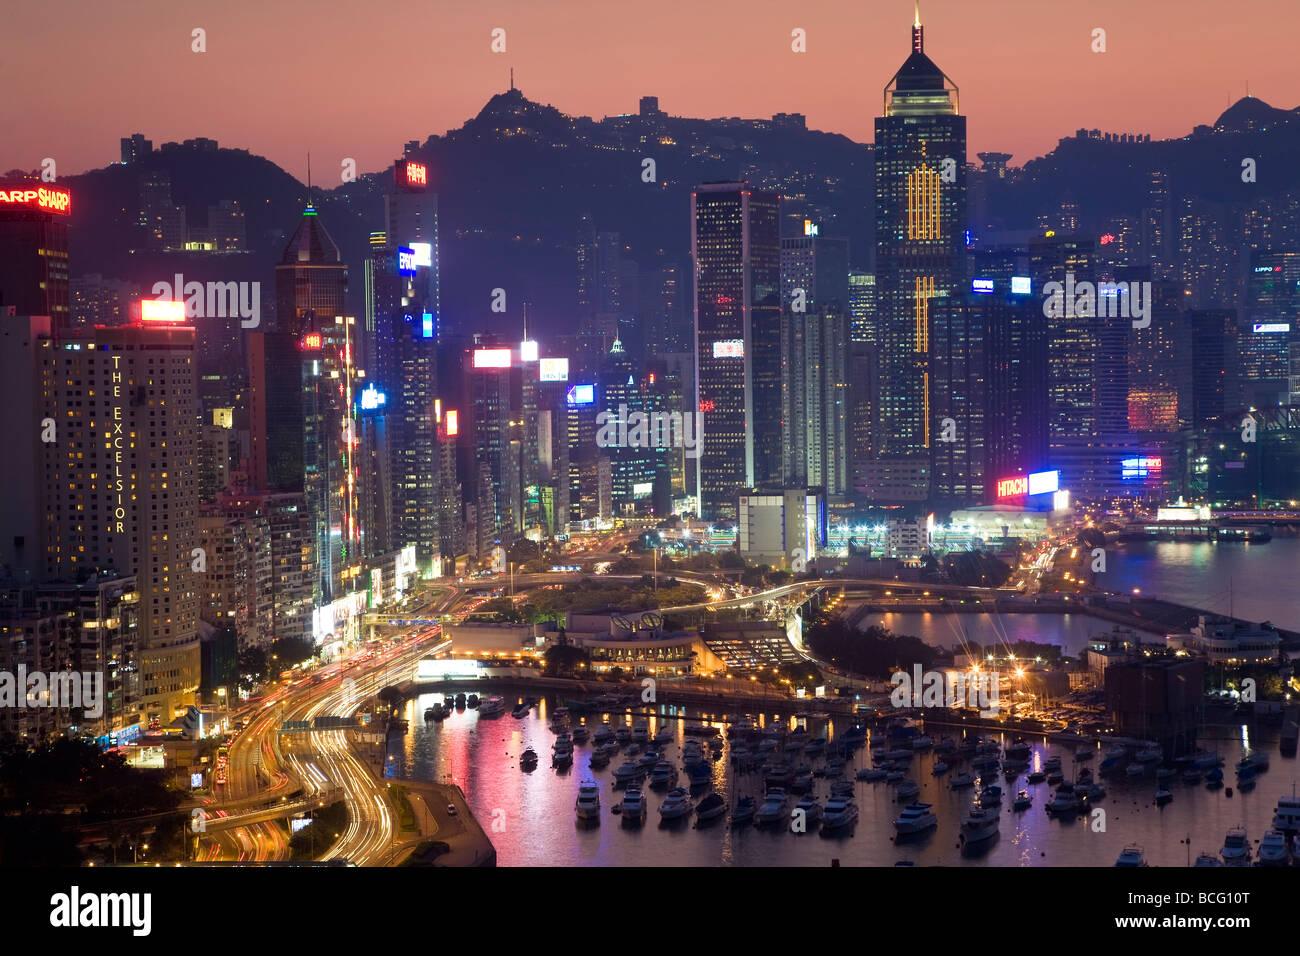 China Hong Kong Hong Kong Island view across harbour to Victoria Peak at sunset - Stock Image